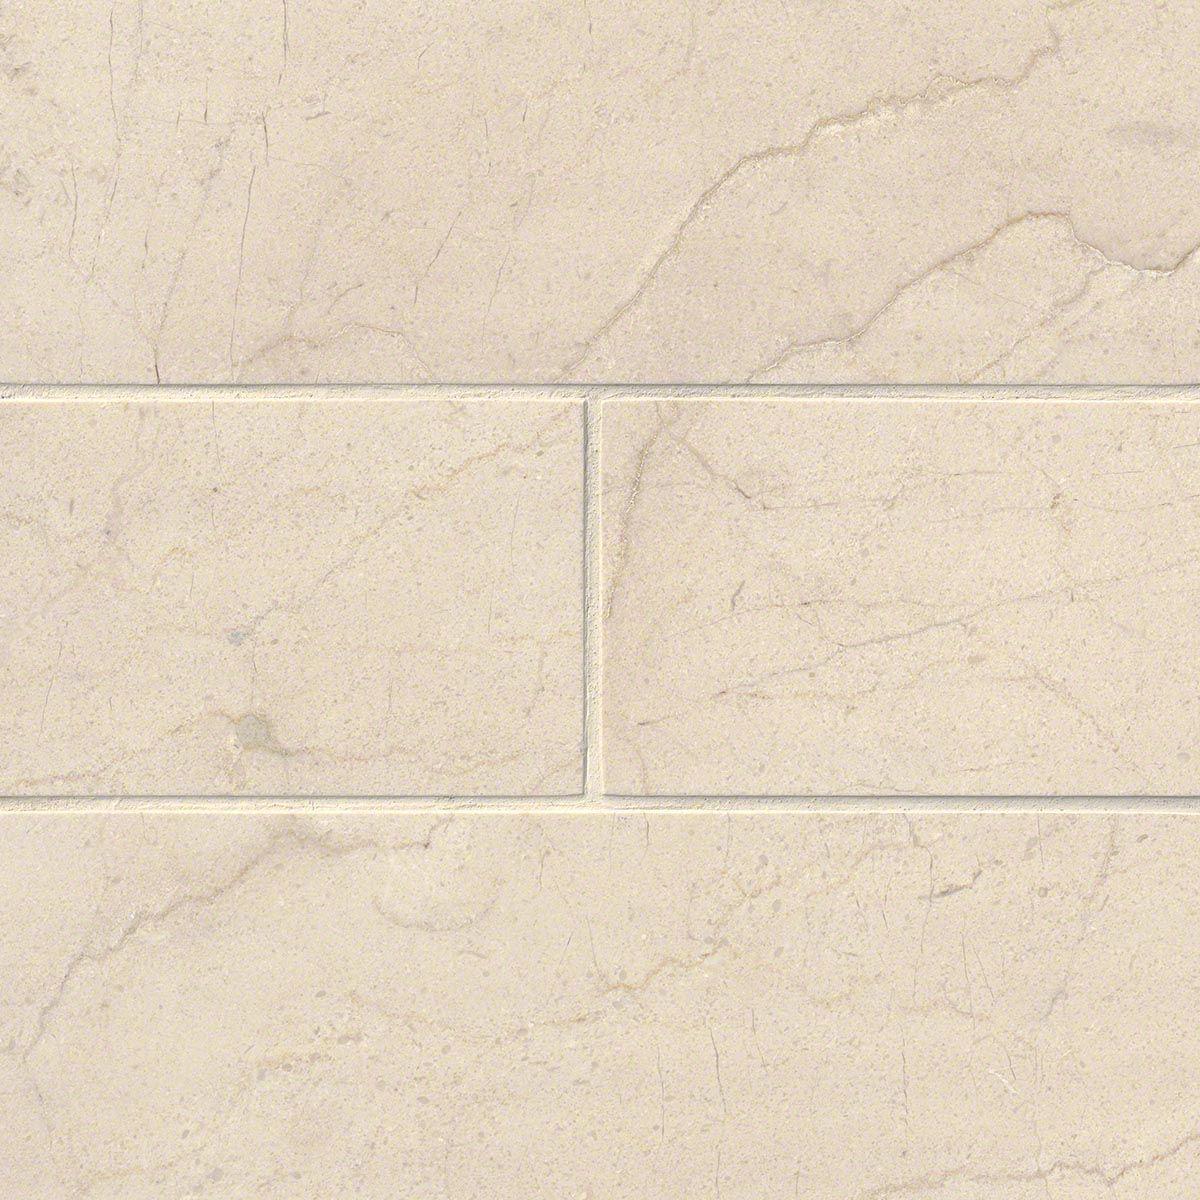 Crema marfil 4x12 polished marble backsplash tile kitchen crema marfil 4x12 polished marble backsplash tile dailygadgetfo Image collections